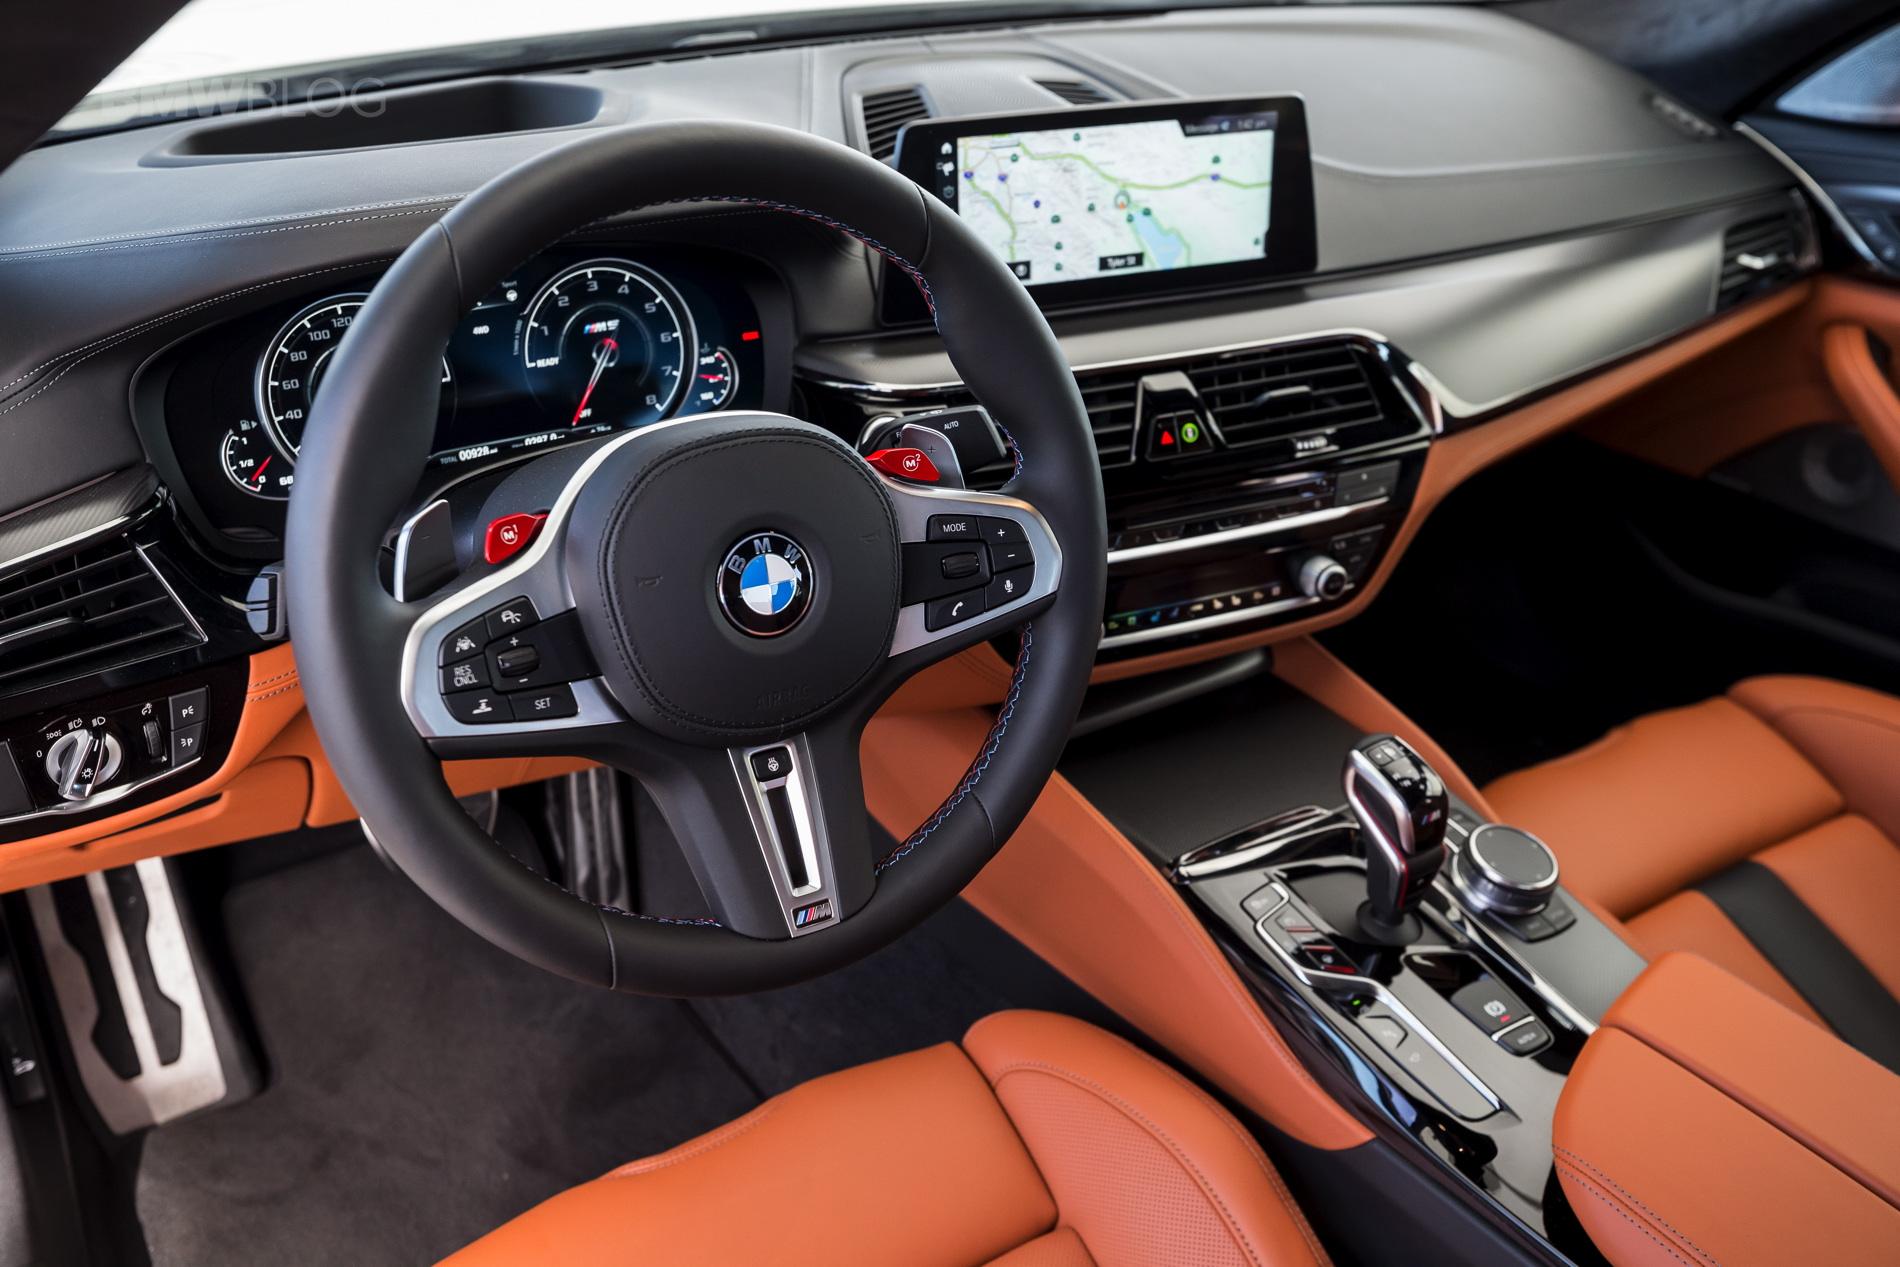 2018 BMW M5 review test 39 مقایسهٔ شانهبهشانهٔ نسل قدیم و جدید بامو M5   اجاره ماشین